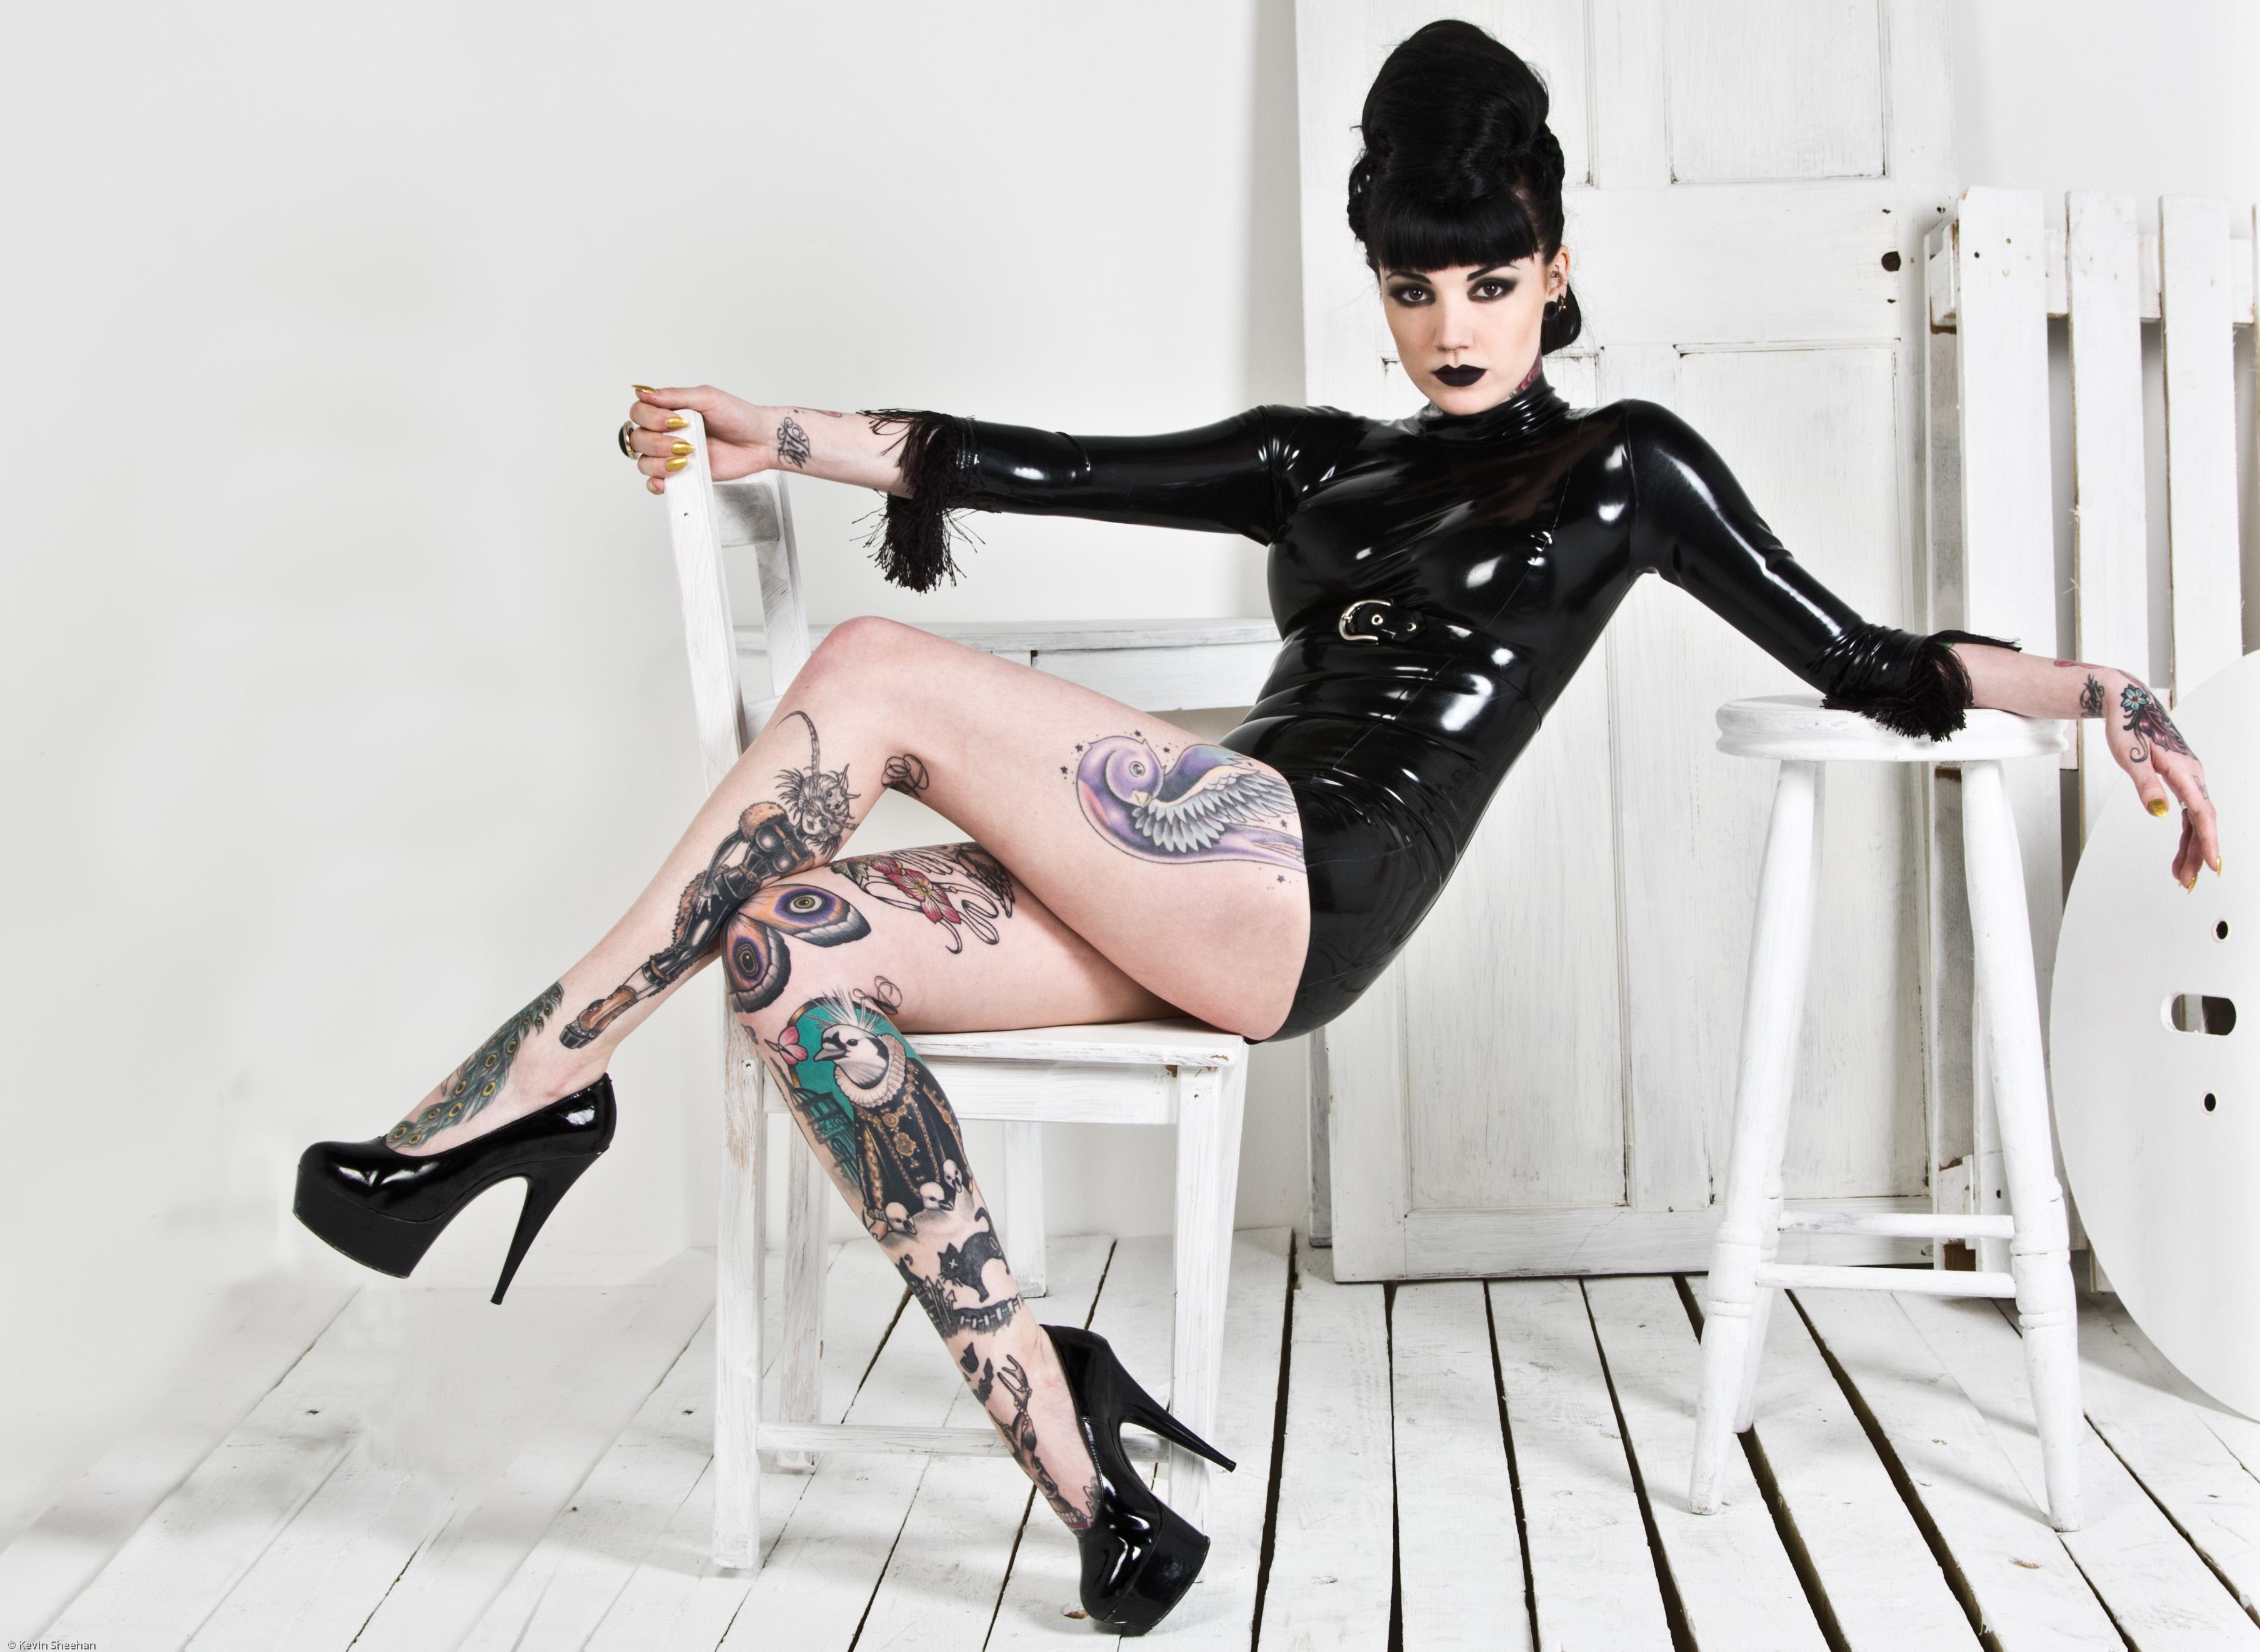 Leg fetish pictures